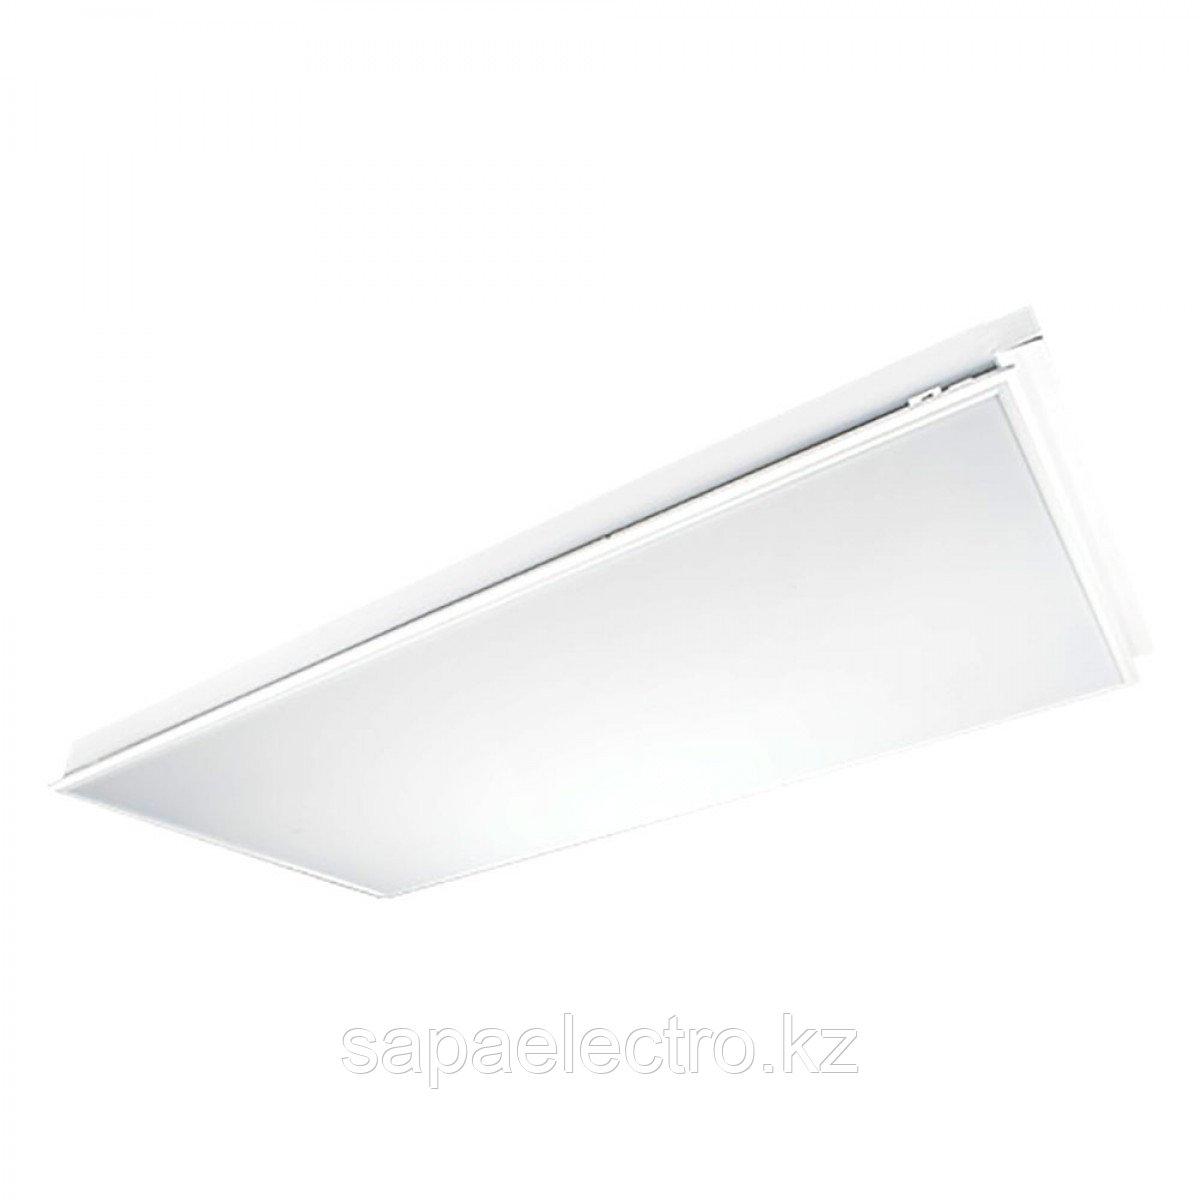 Свет-к LZV 4X36W S/A OPAL MEGALUX ELECTR (TS)